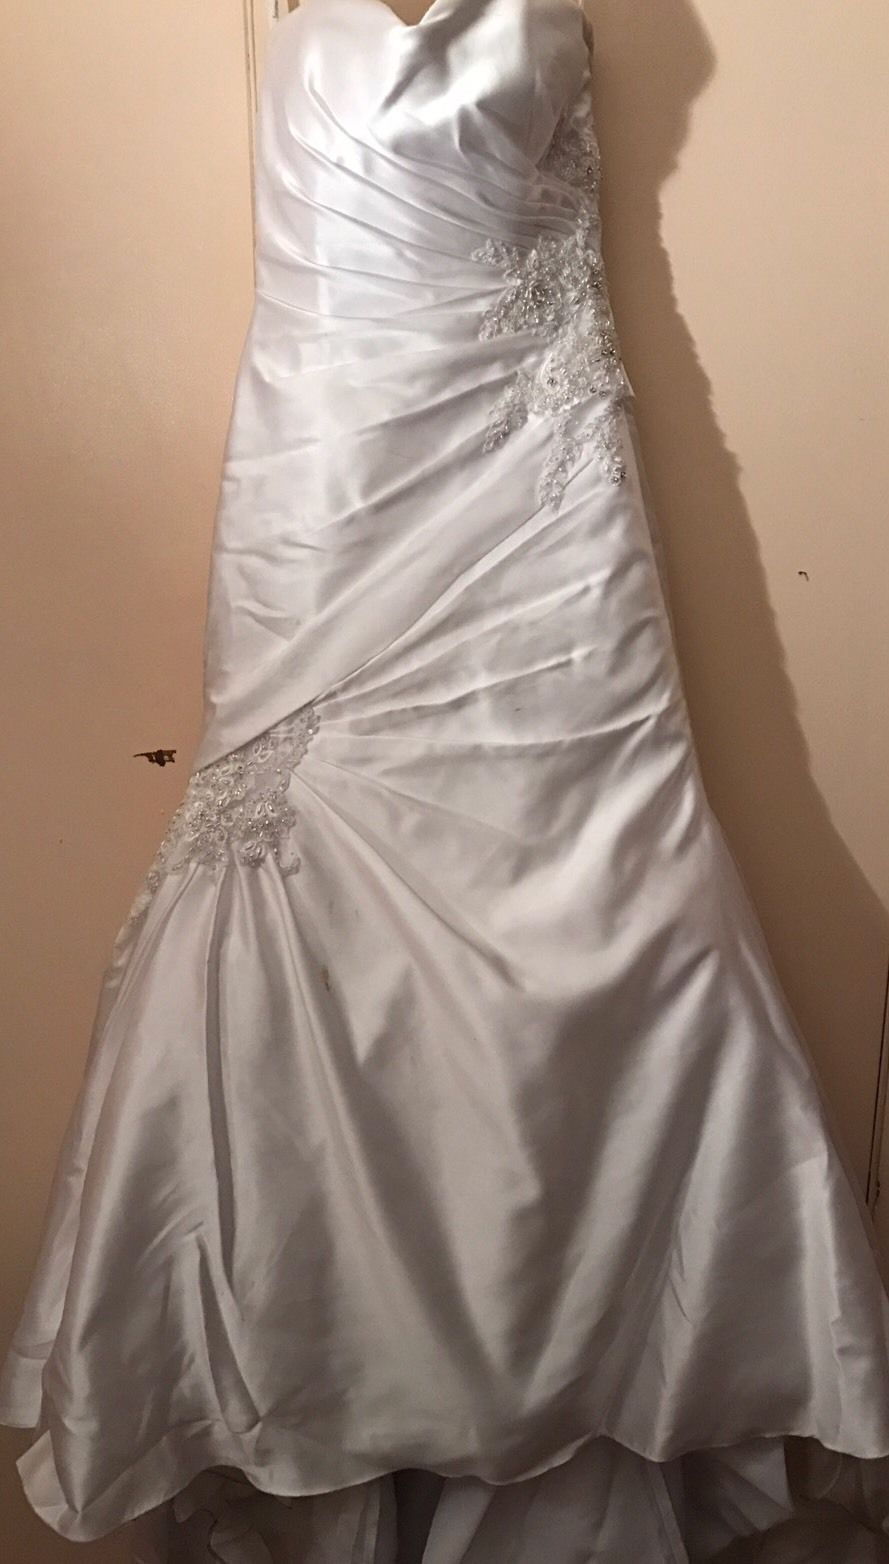 0d6e65ffc 599.99 | BEAUTIFUL WEDDING DRESS, Retail $1400 ❤ #beautiful #wedding #dress  #retail #1400 #fit #Trends #Juvenil #ForWomen #tshirts #fashioninspo  #shopping ...